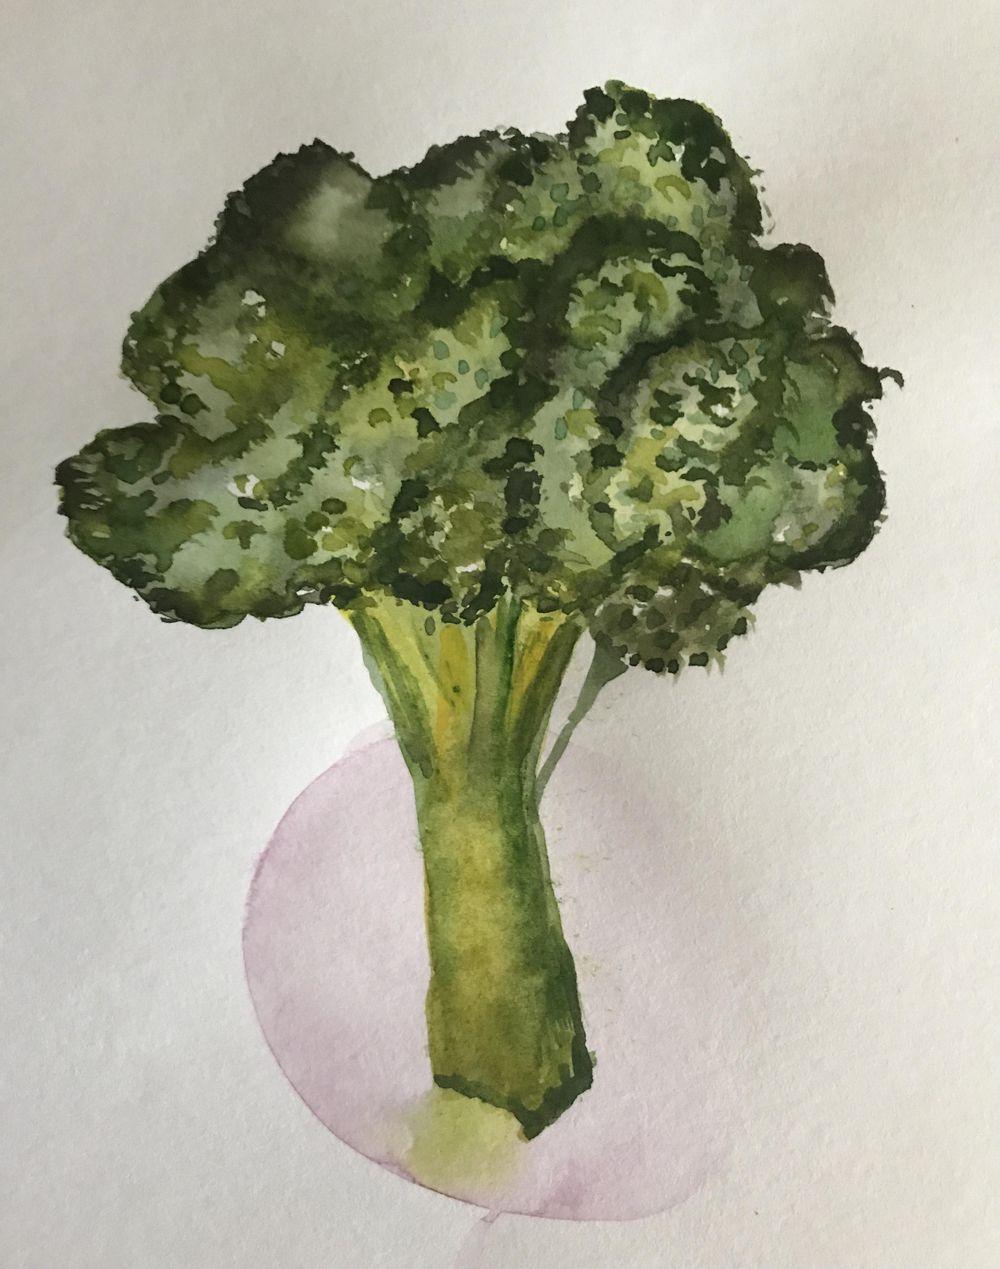 Veggies - image 3 - student project